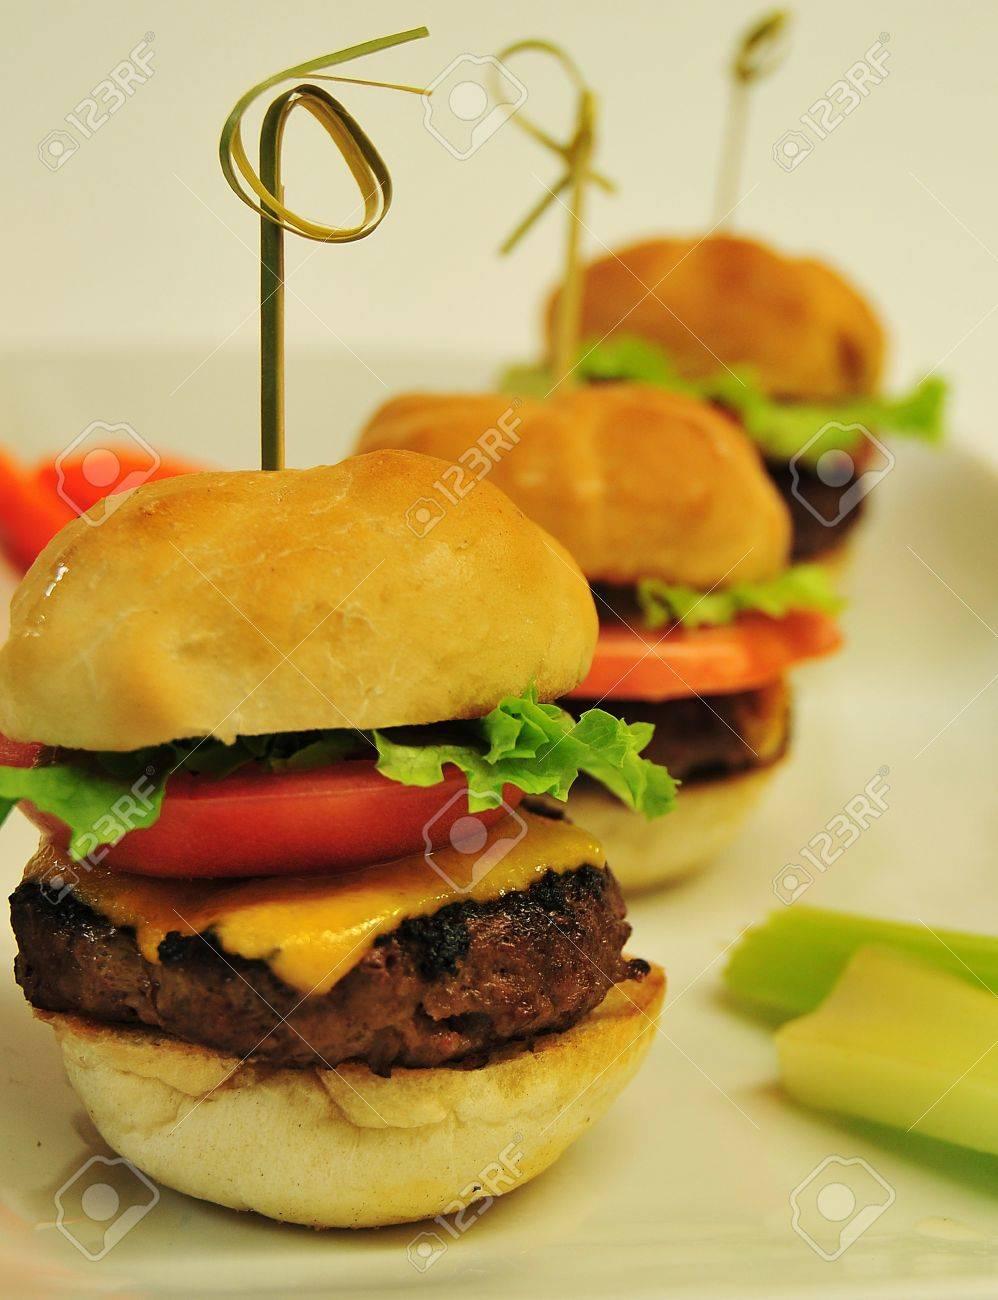 mini burgers close up Stock Photo - 8653912